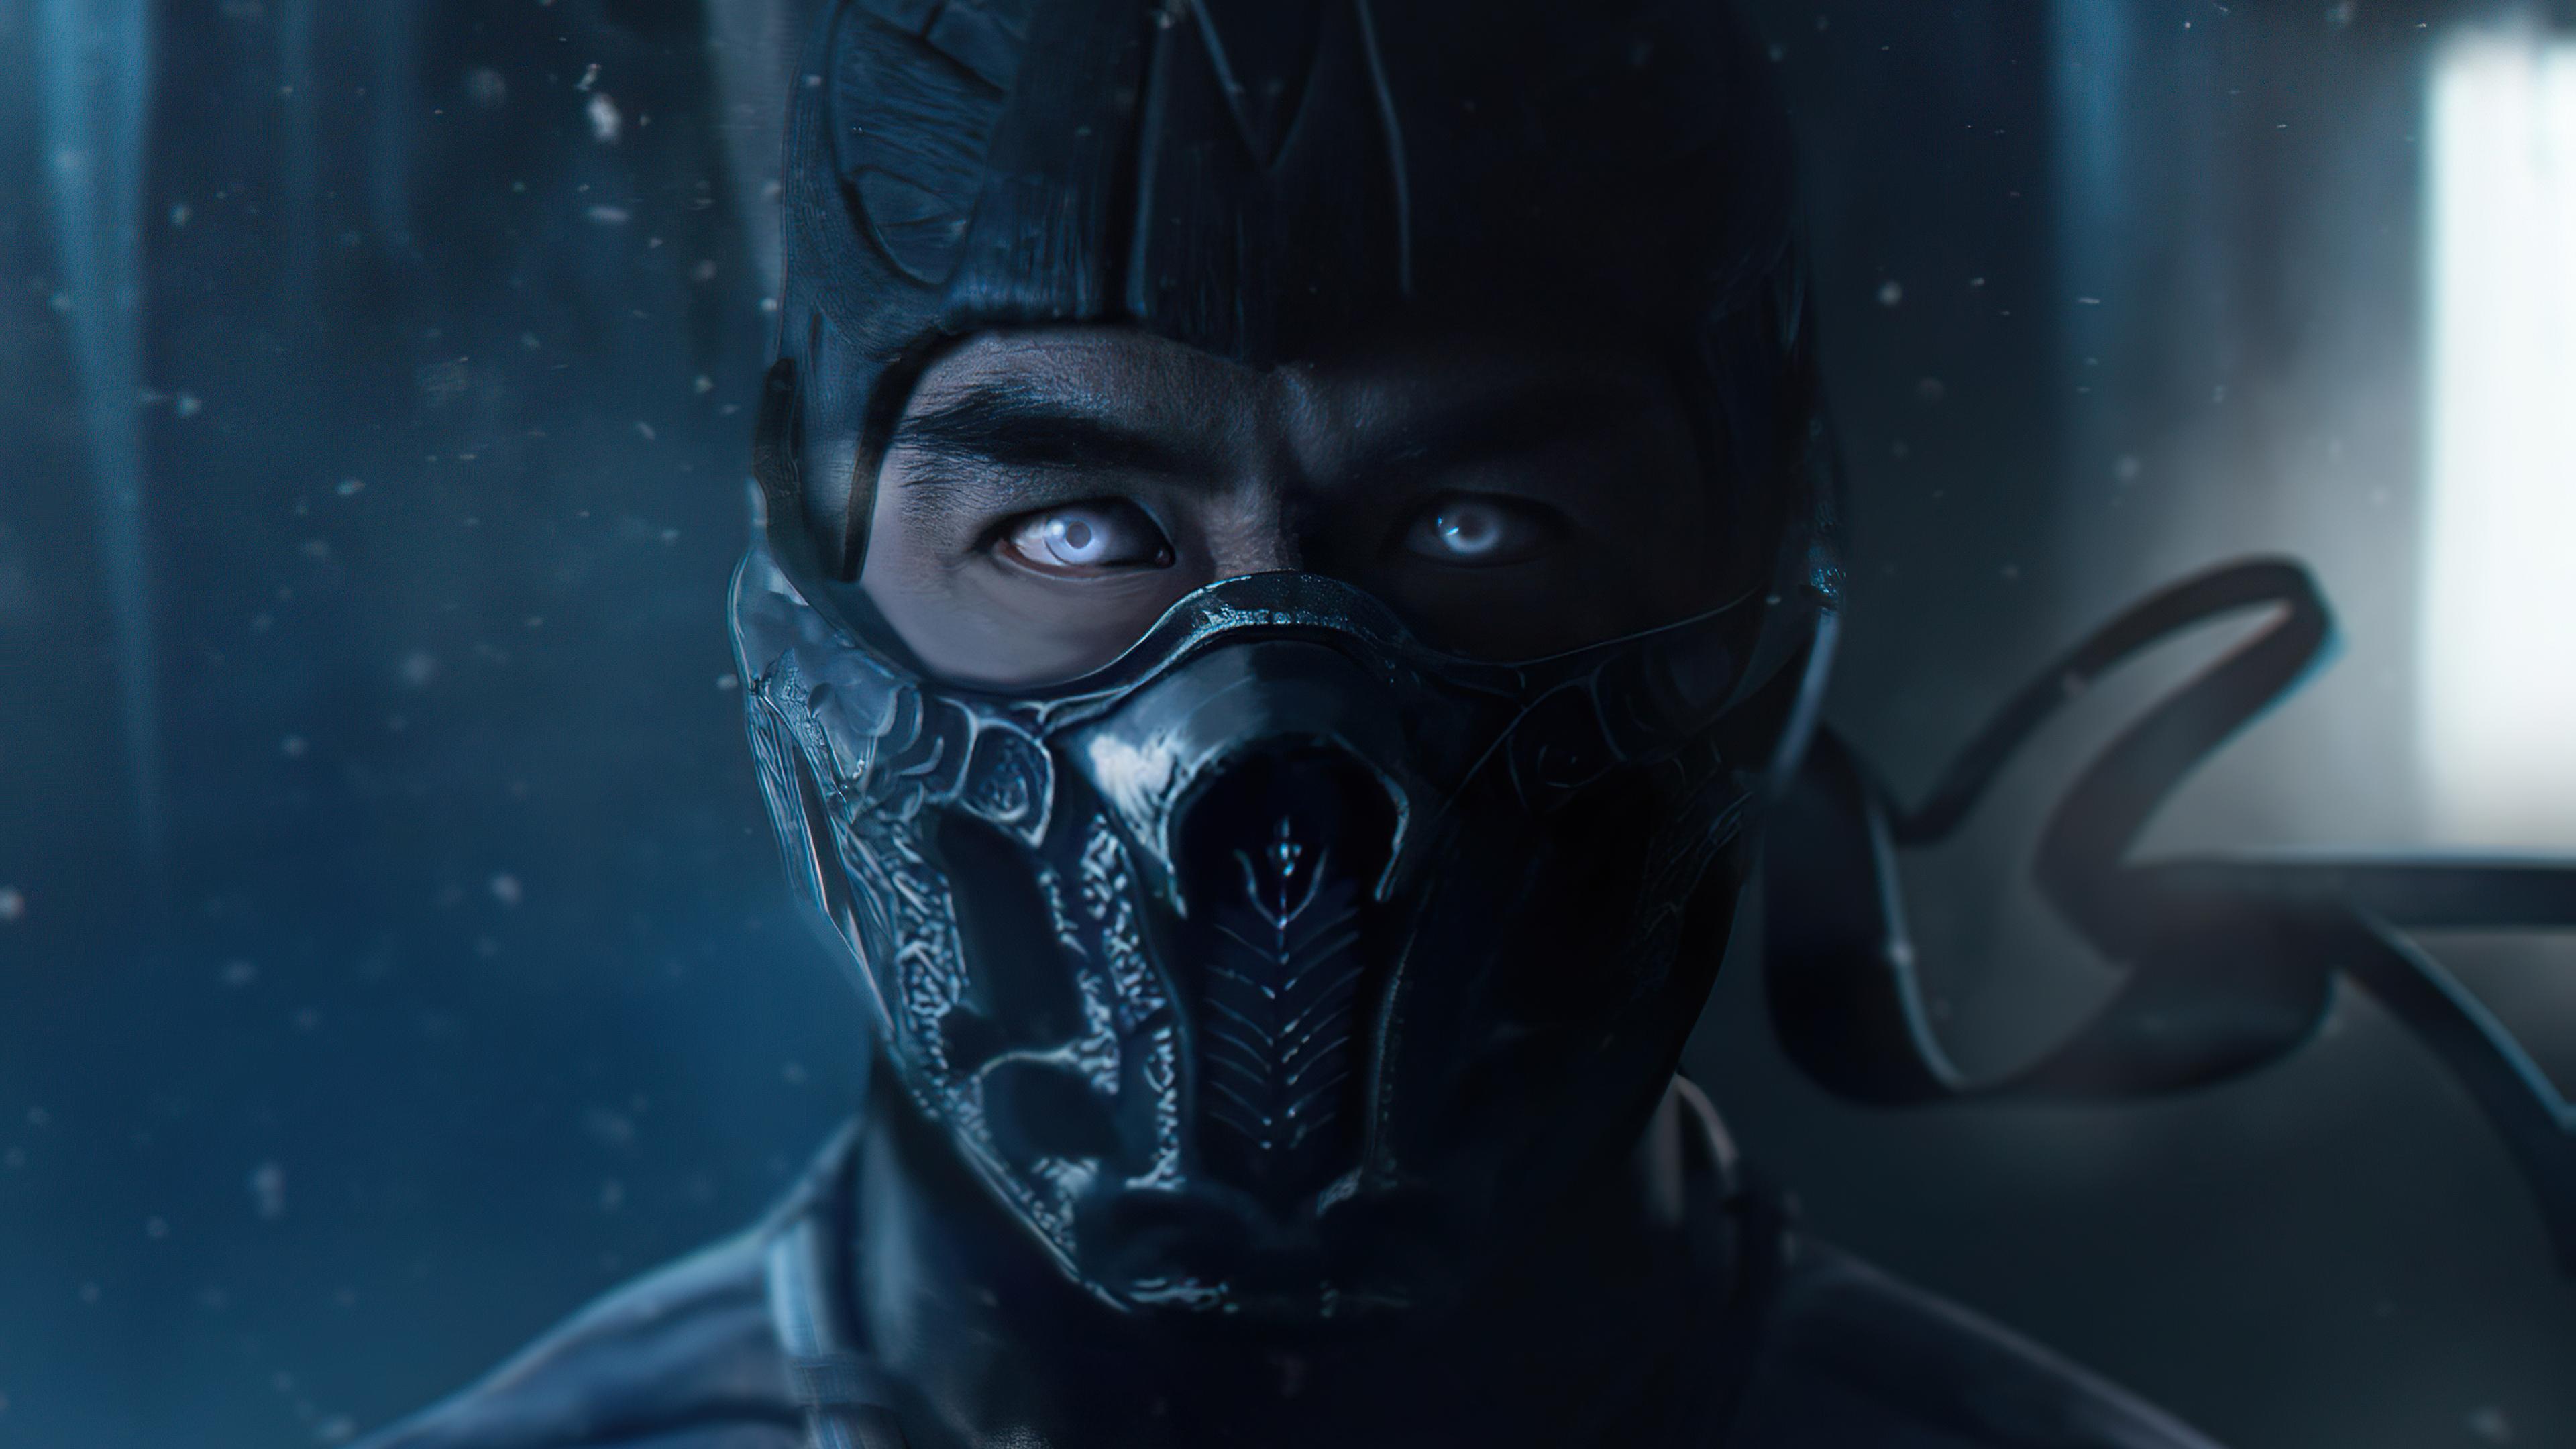 mortal kombat sub zero movie 4k 1618165475 - Mortal Kombat Sub Zero Movie 4k - Mortal Kombat Sub Zero Movie 4k wallpapers